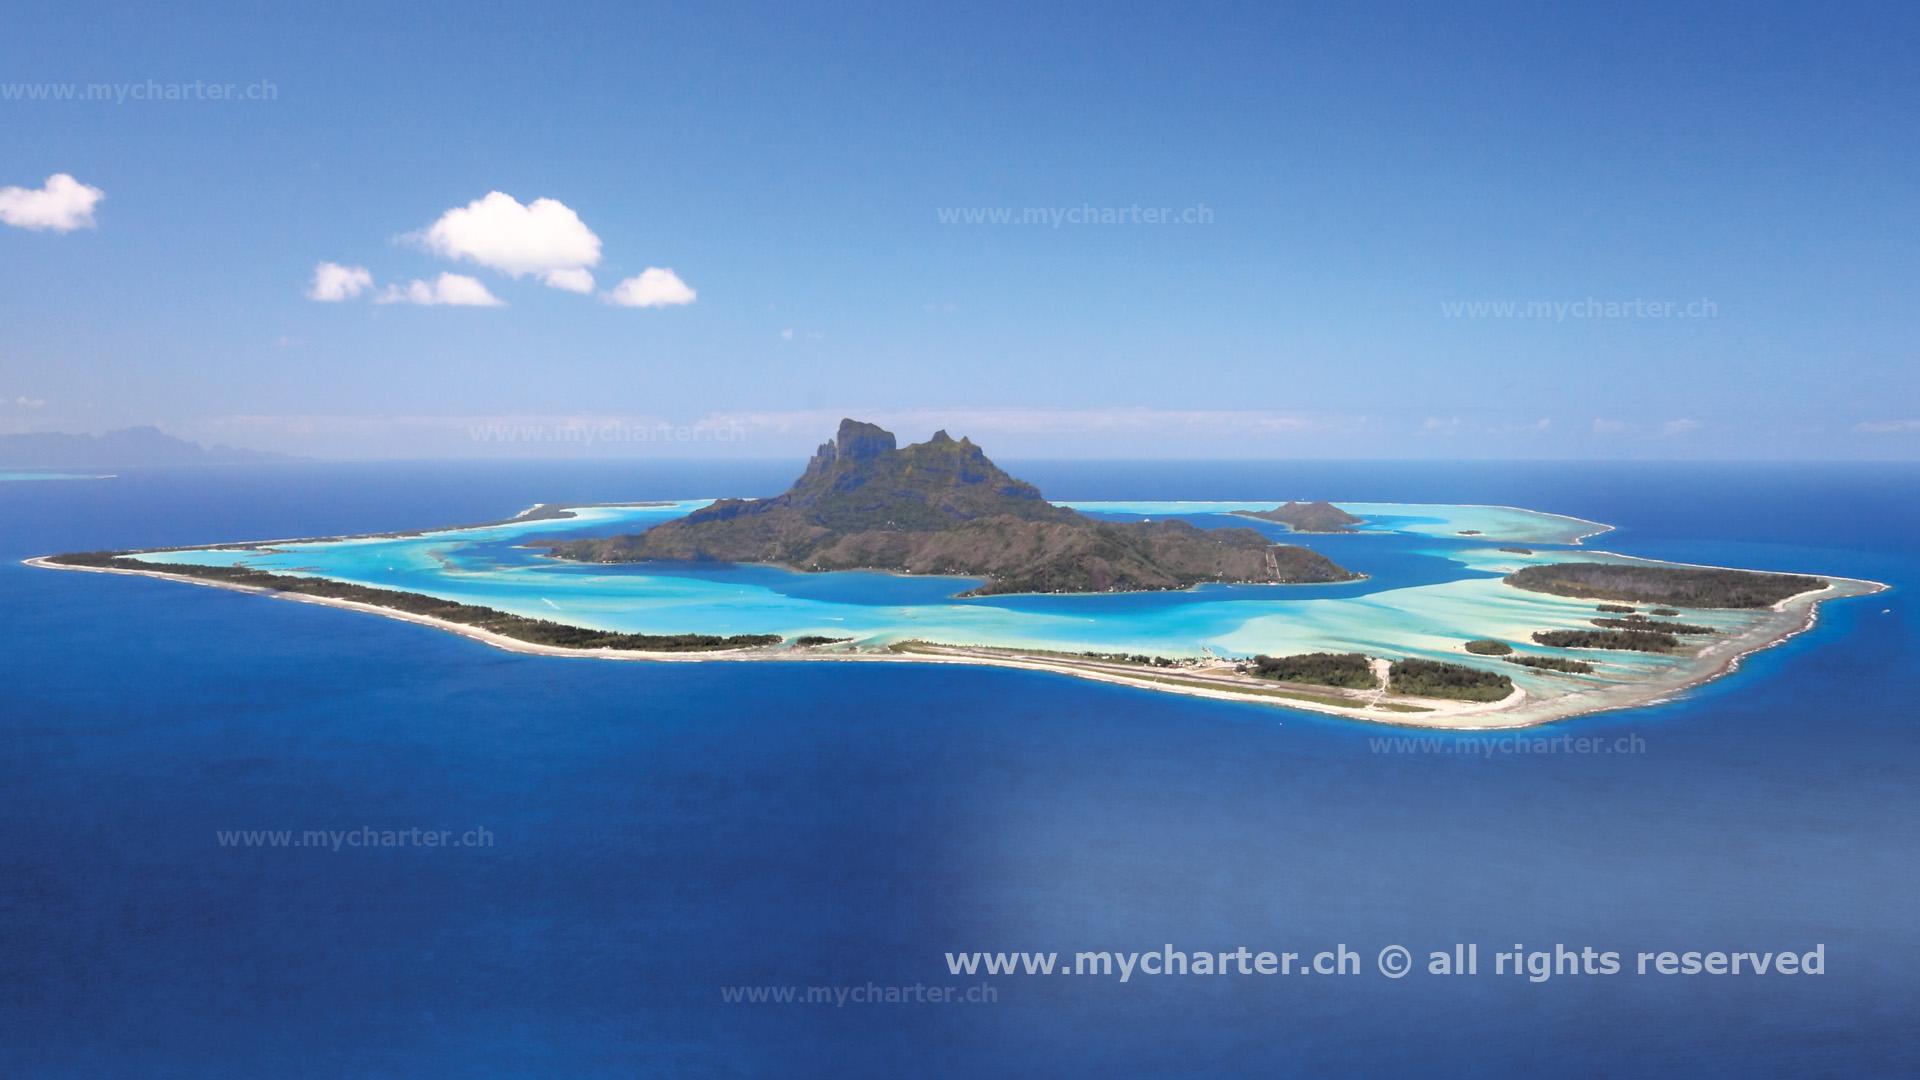 Yachtcharter Südesee - Tahiti - Bora Bora